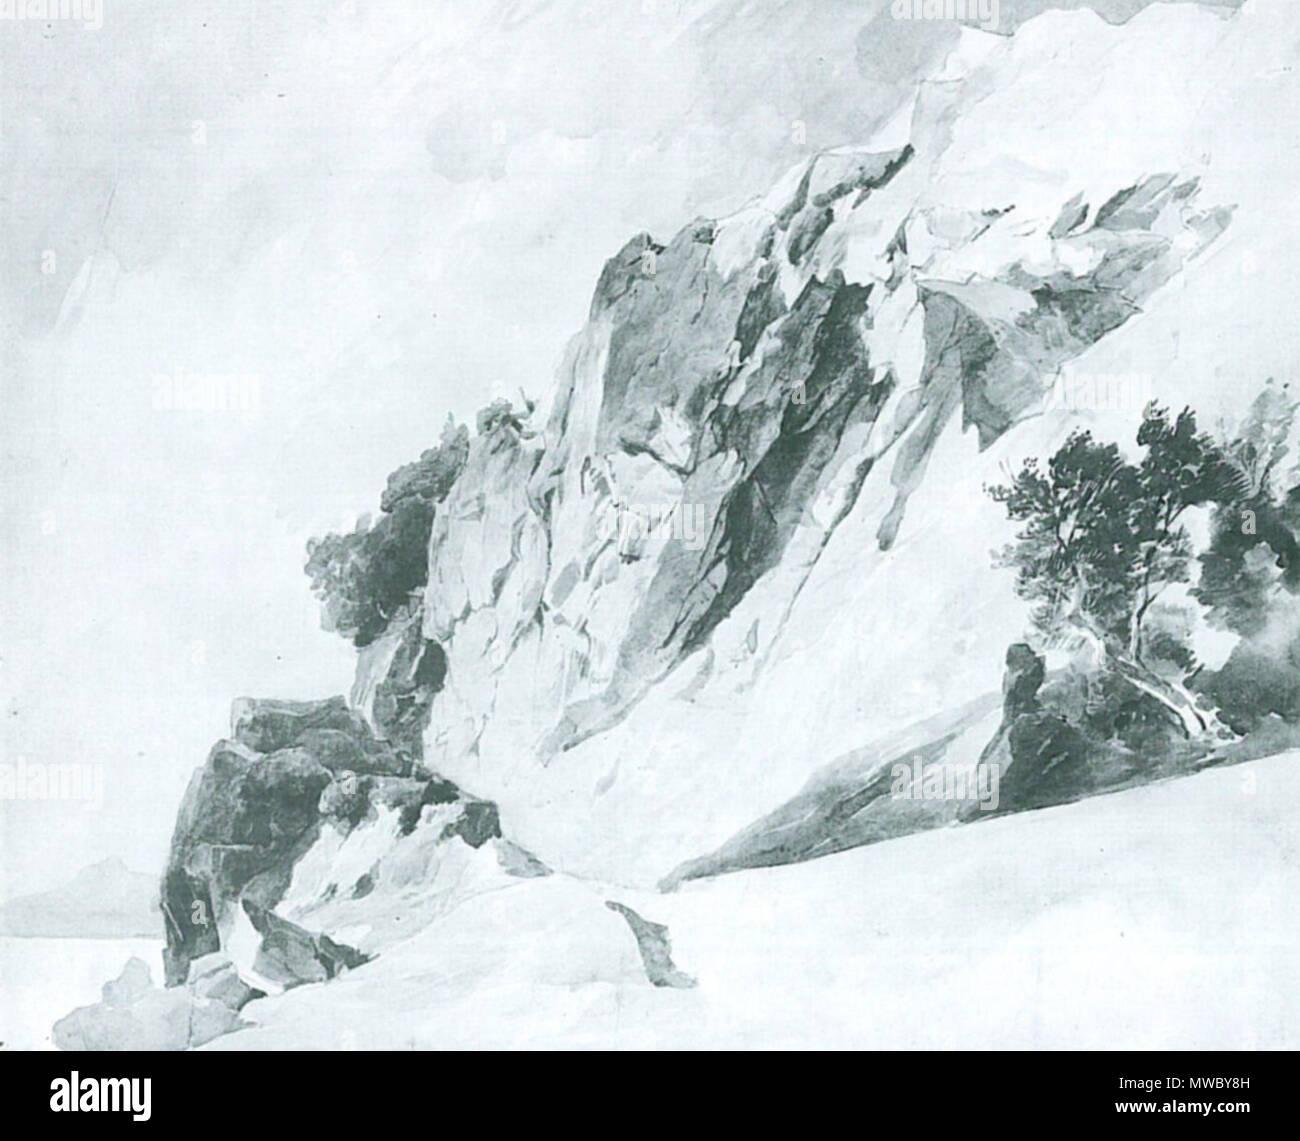 . Deutsch: Edmund Kanoldt: Felsen am Meer. 48 × 61 cm. Aquarell über Bleistift auf Papier. La Kunsthalle di Mannheim . circa 1890. Edmund Kanoldt (1845-1904) 177 Edmund Kanoldt Felsen am Meer Immagini Stock